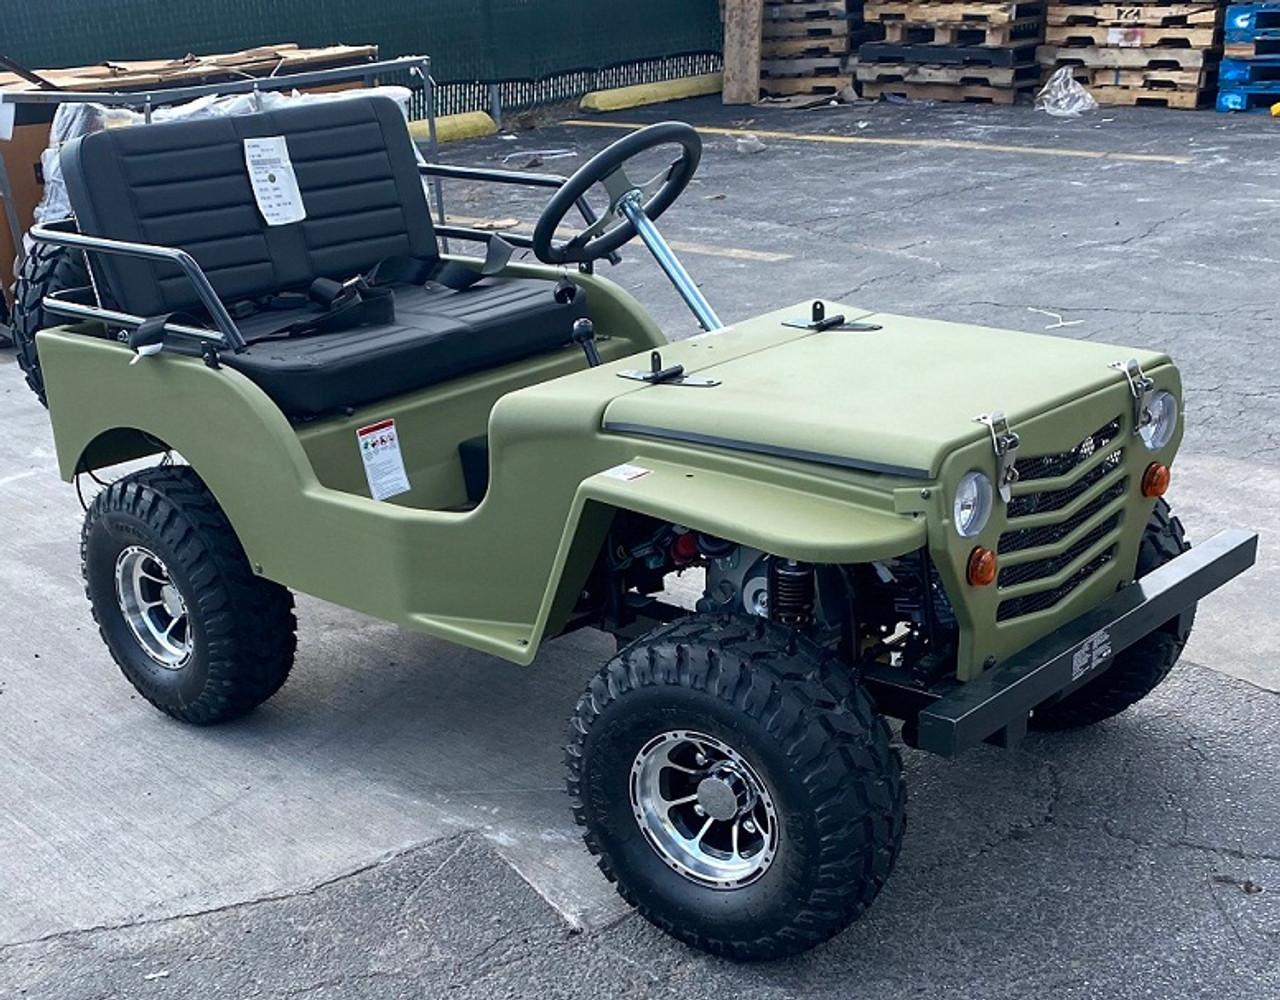 Ice bear Jeep Off-Road 125cc Mini Go-Kart/ Golf Cart - Disc Brakes - Over-Size Tires